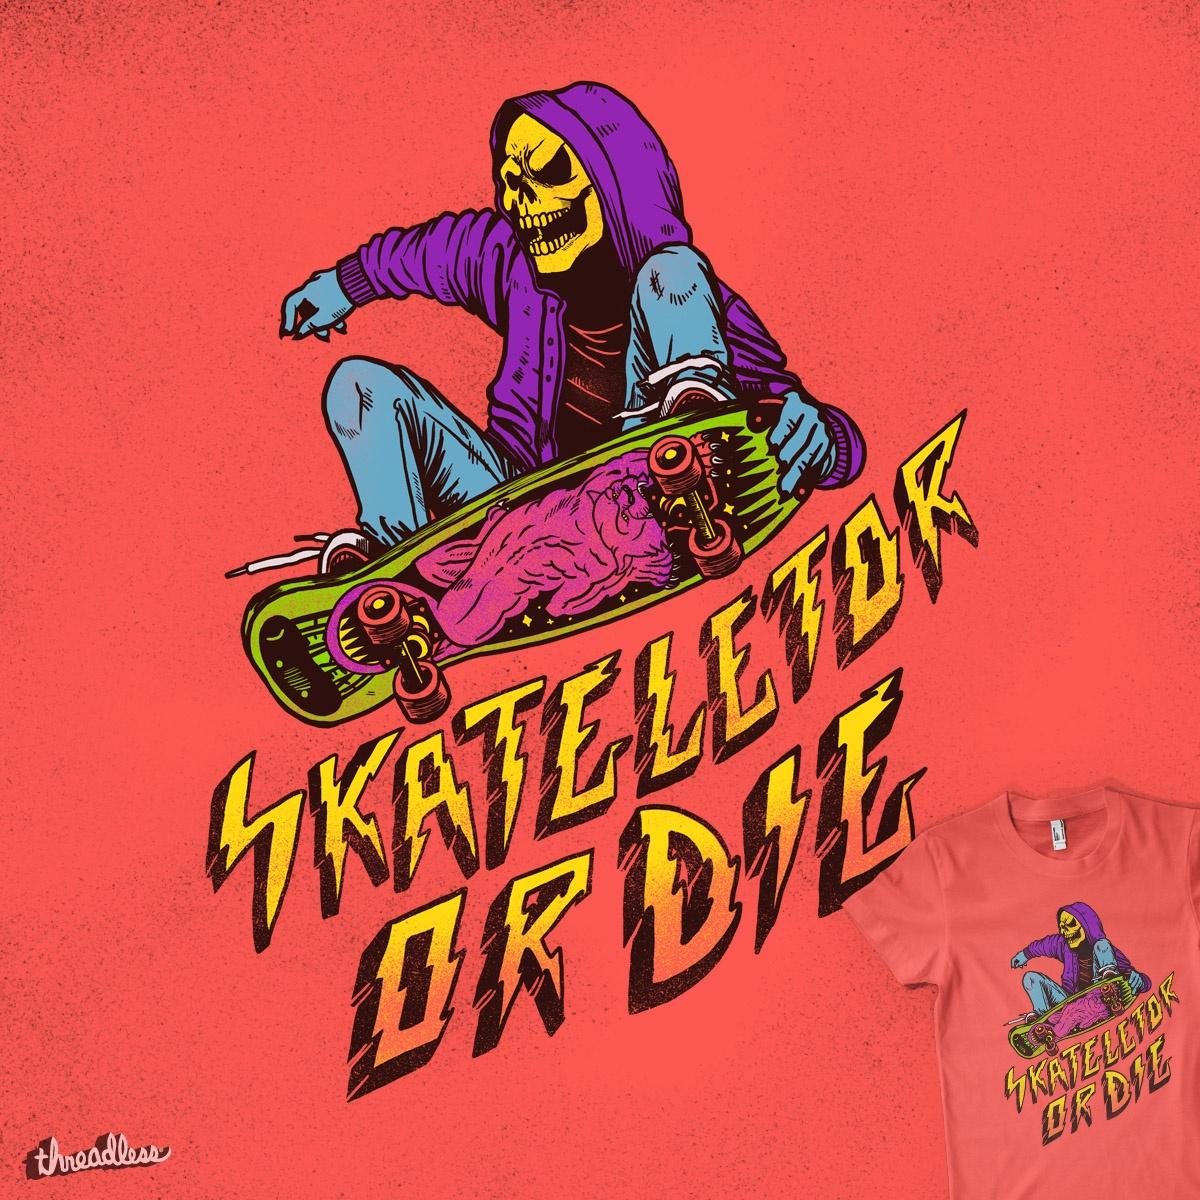 Skateletor or Die by MadKobra on Threadless